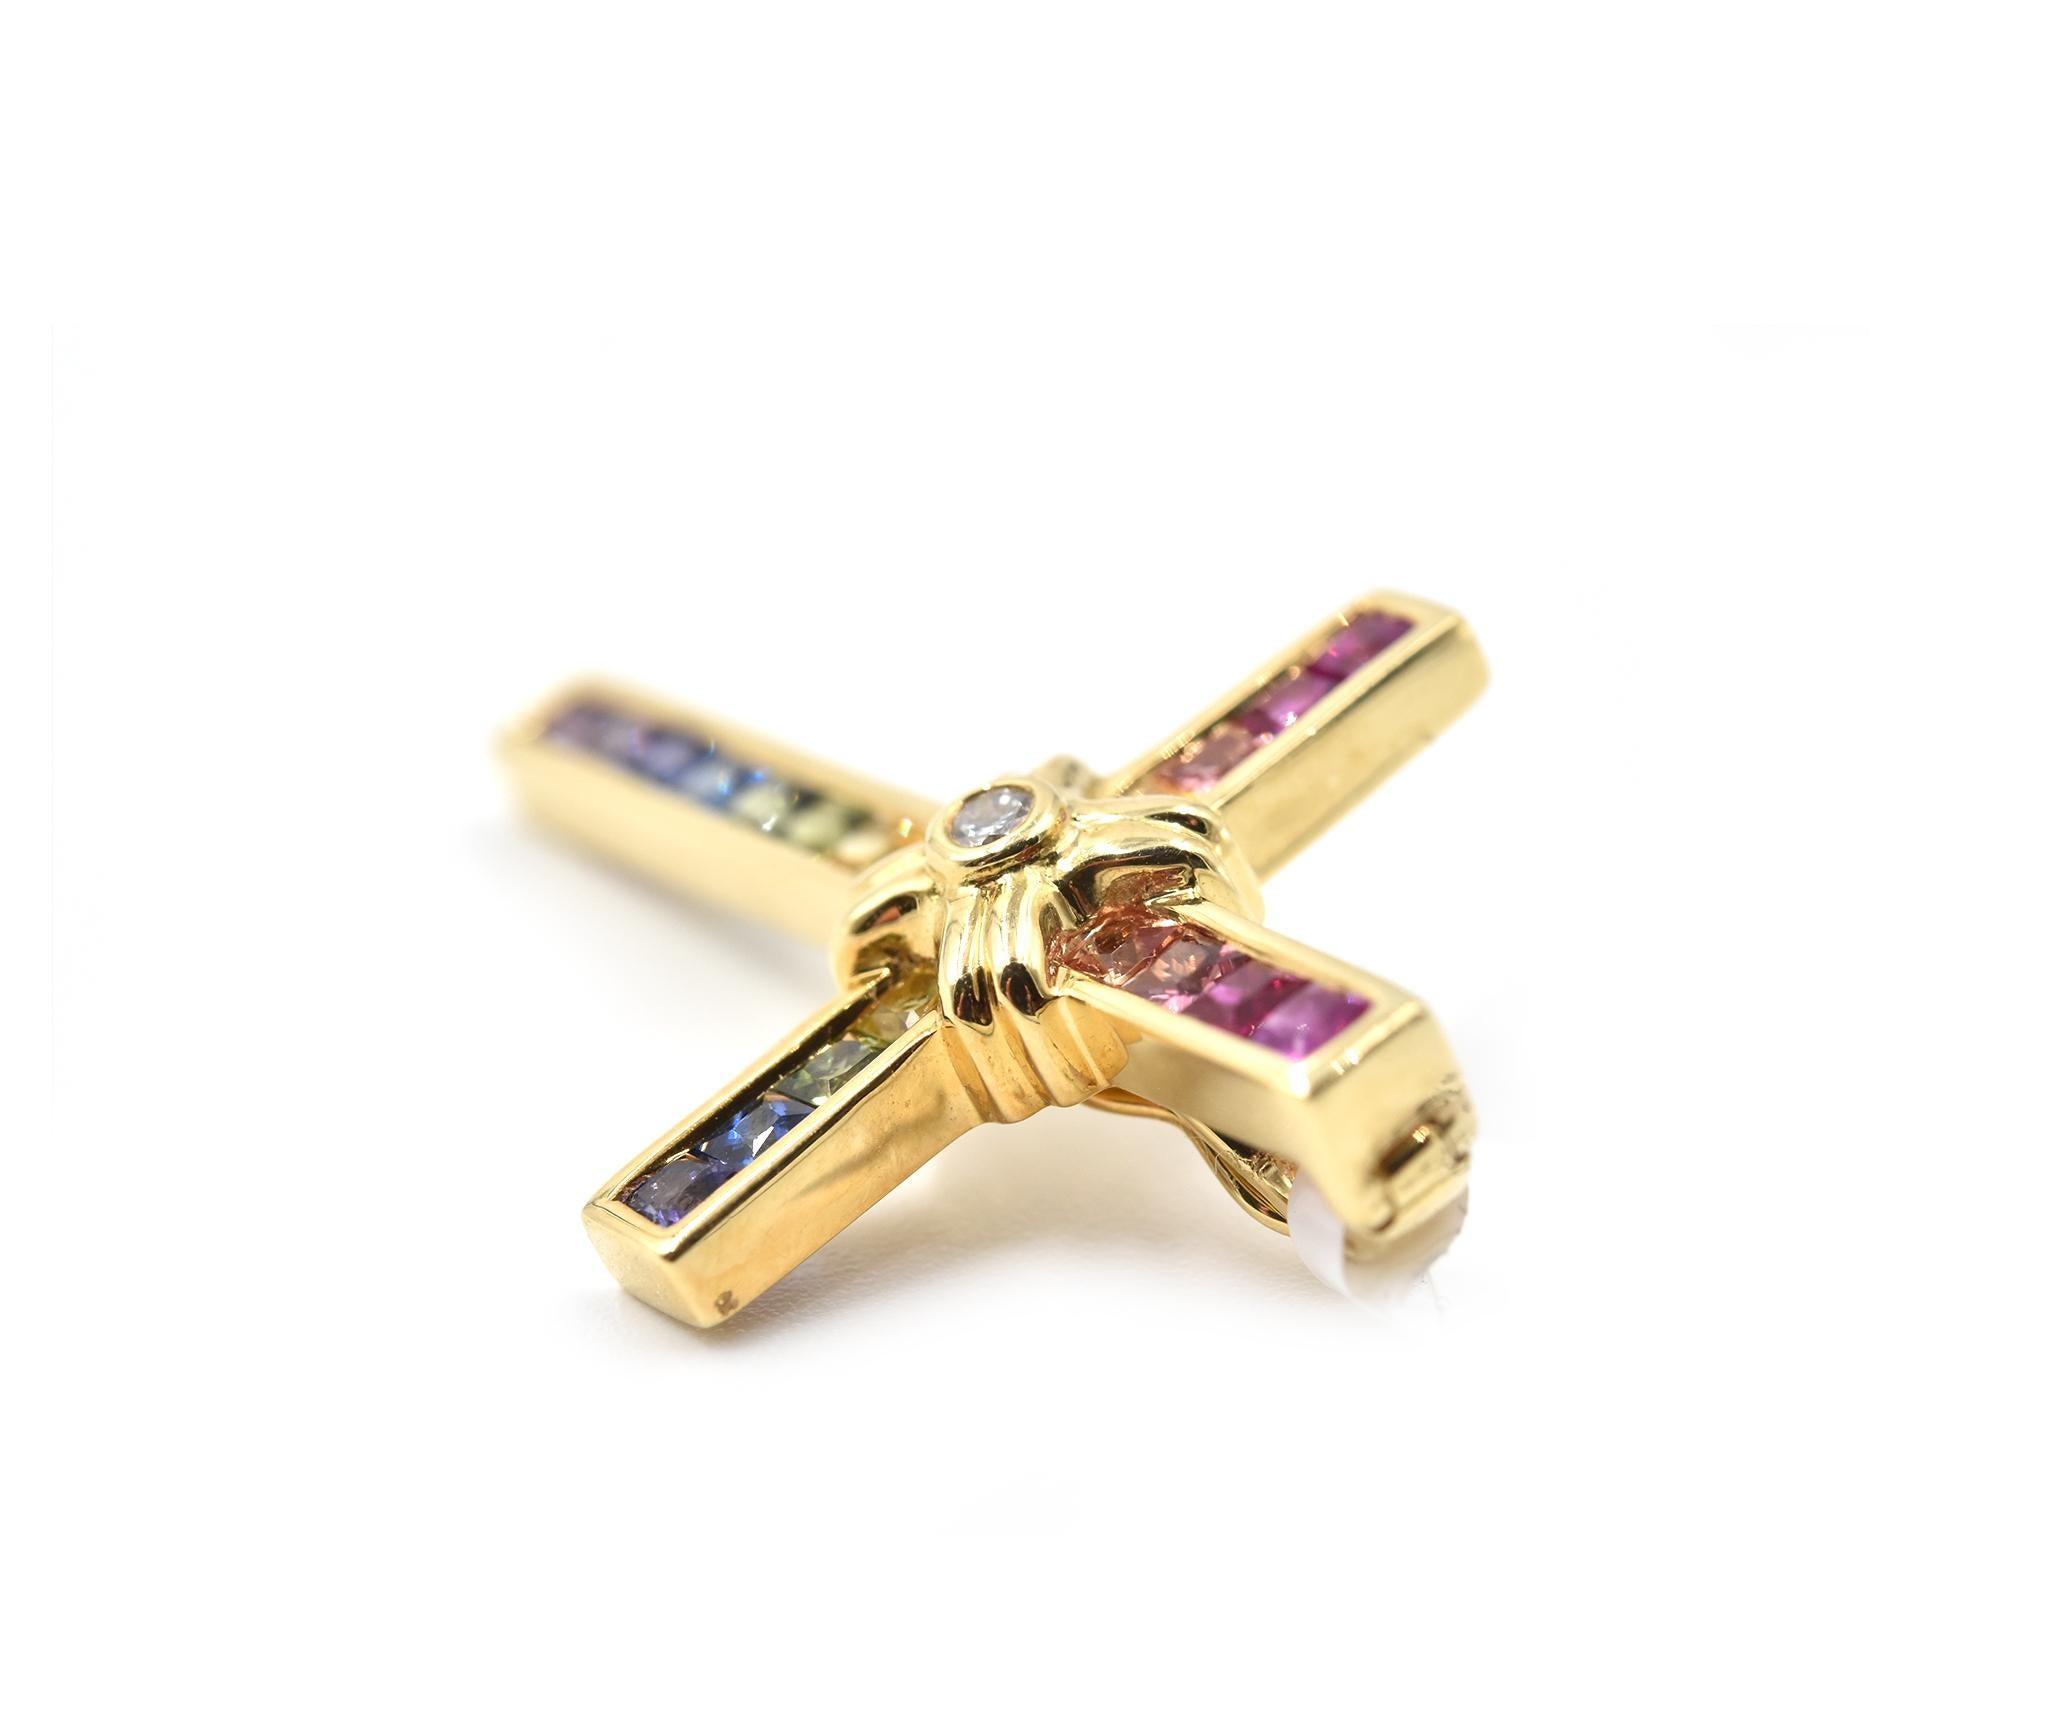 bb3a75467a 1.10 Carat Rainbow Sapphire and Diamond 18 Karat Yellow Gold Cross Pendant  For Sale at 1stdibs